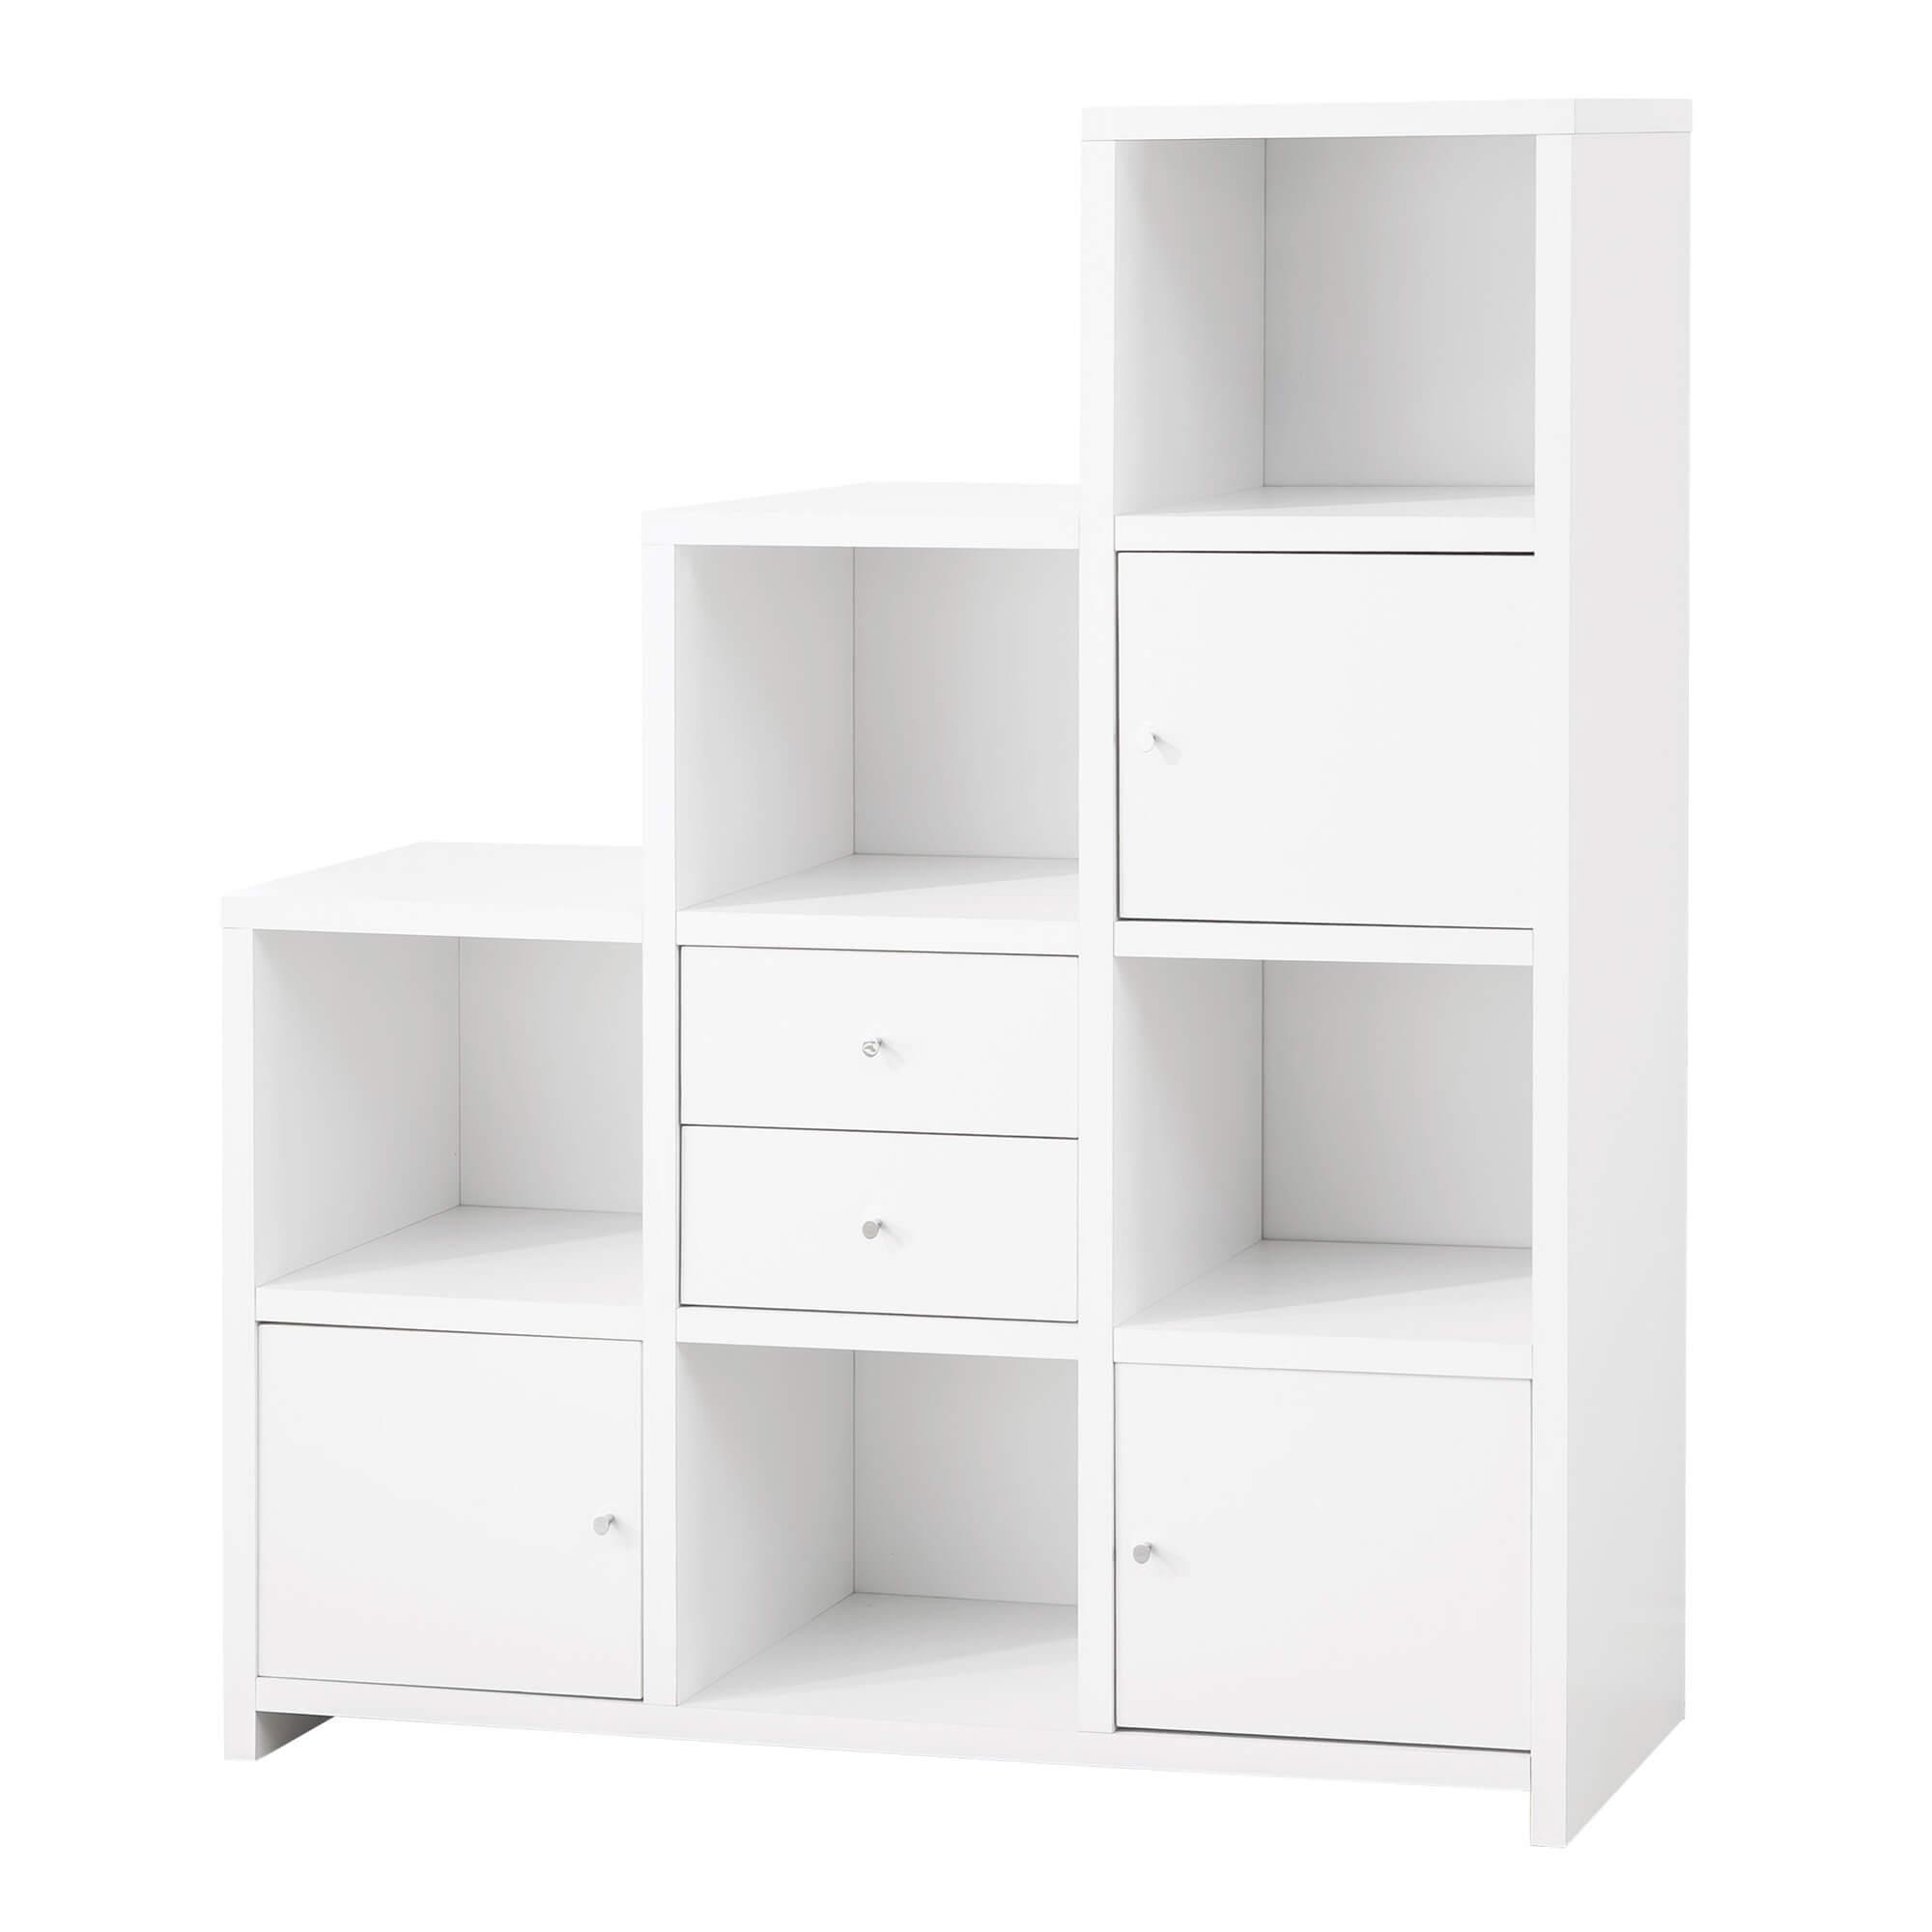 twenty 9 cube bookcases shelves and storage options. Black Bedroom Furniture Sets. Home Design Ideas